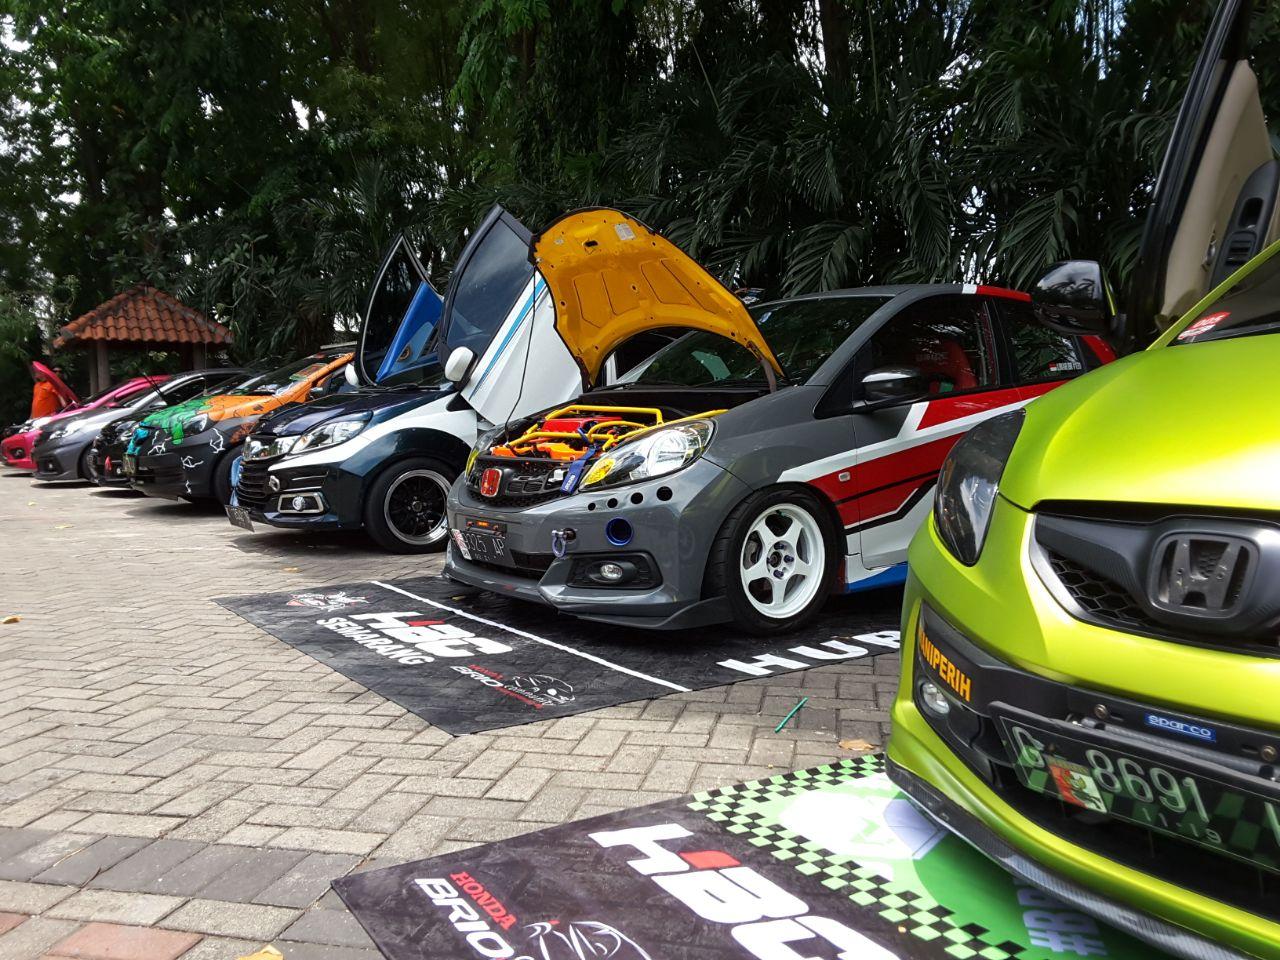 MUNAS Dan JAMNAS Honda Brio Community